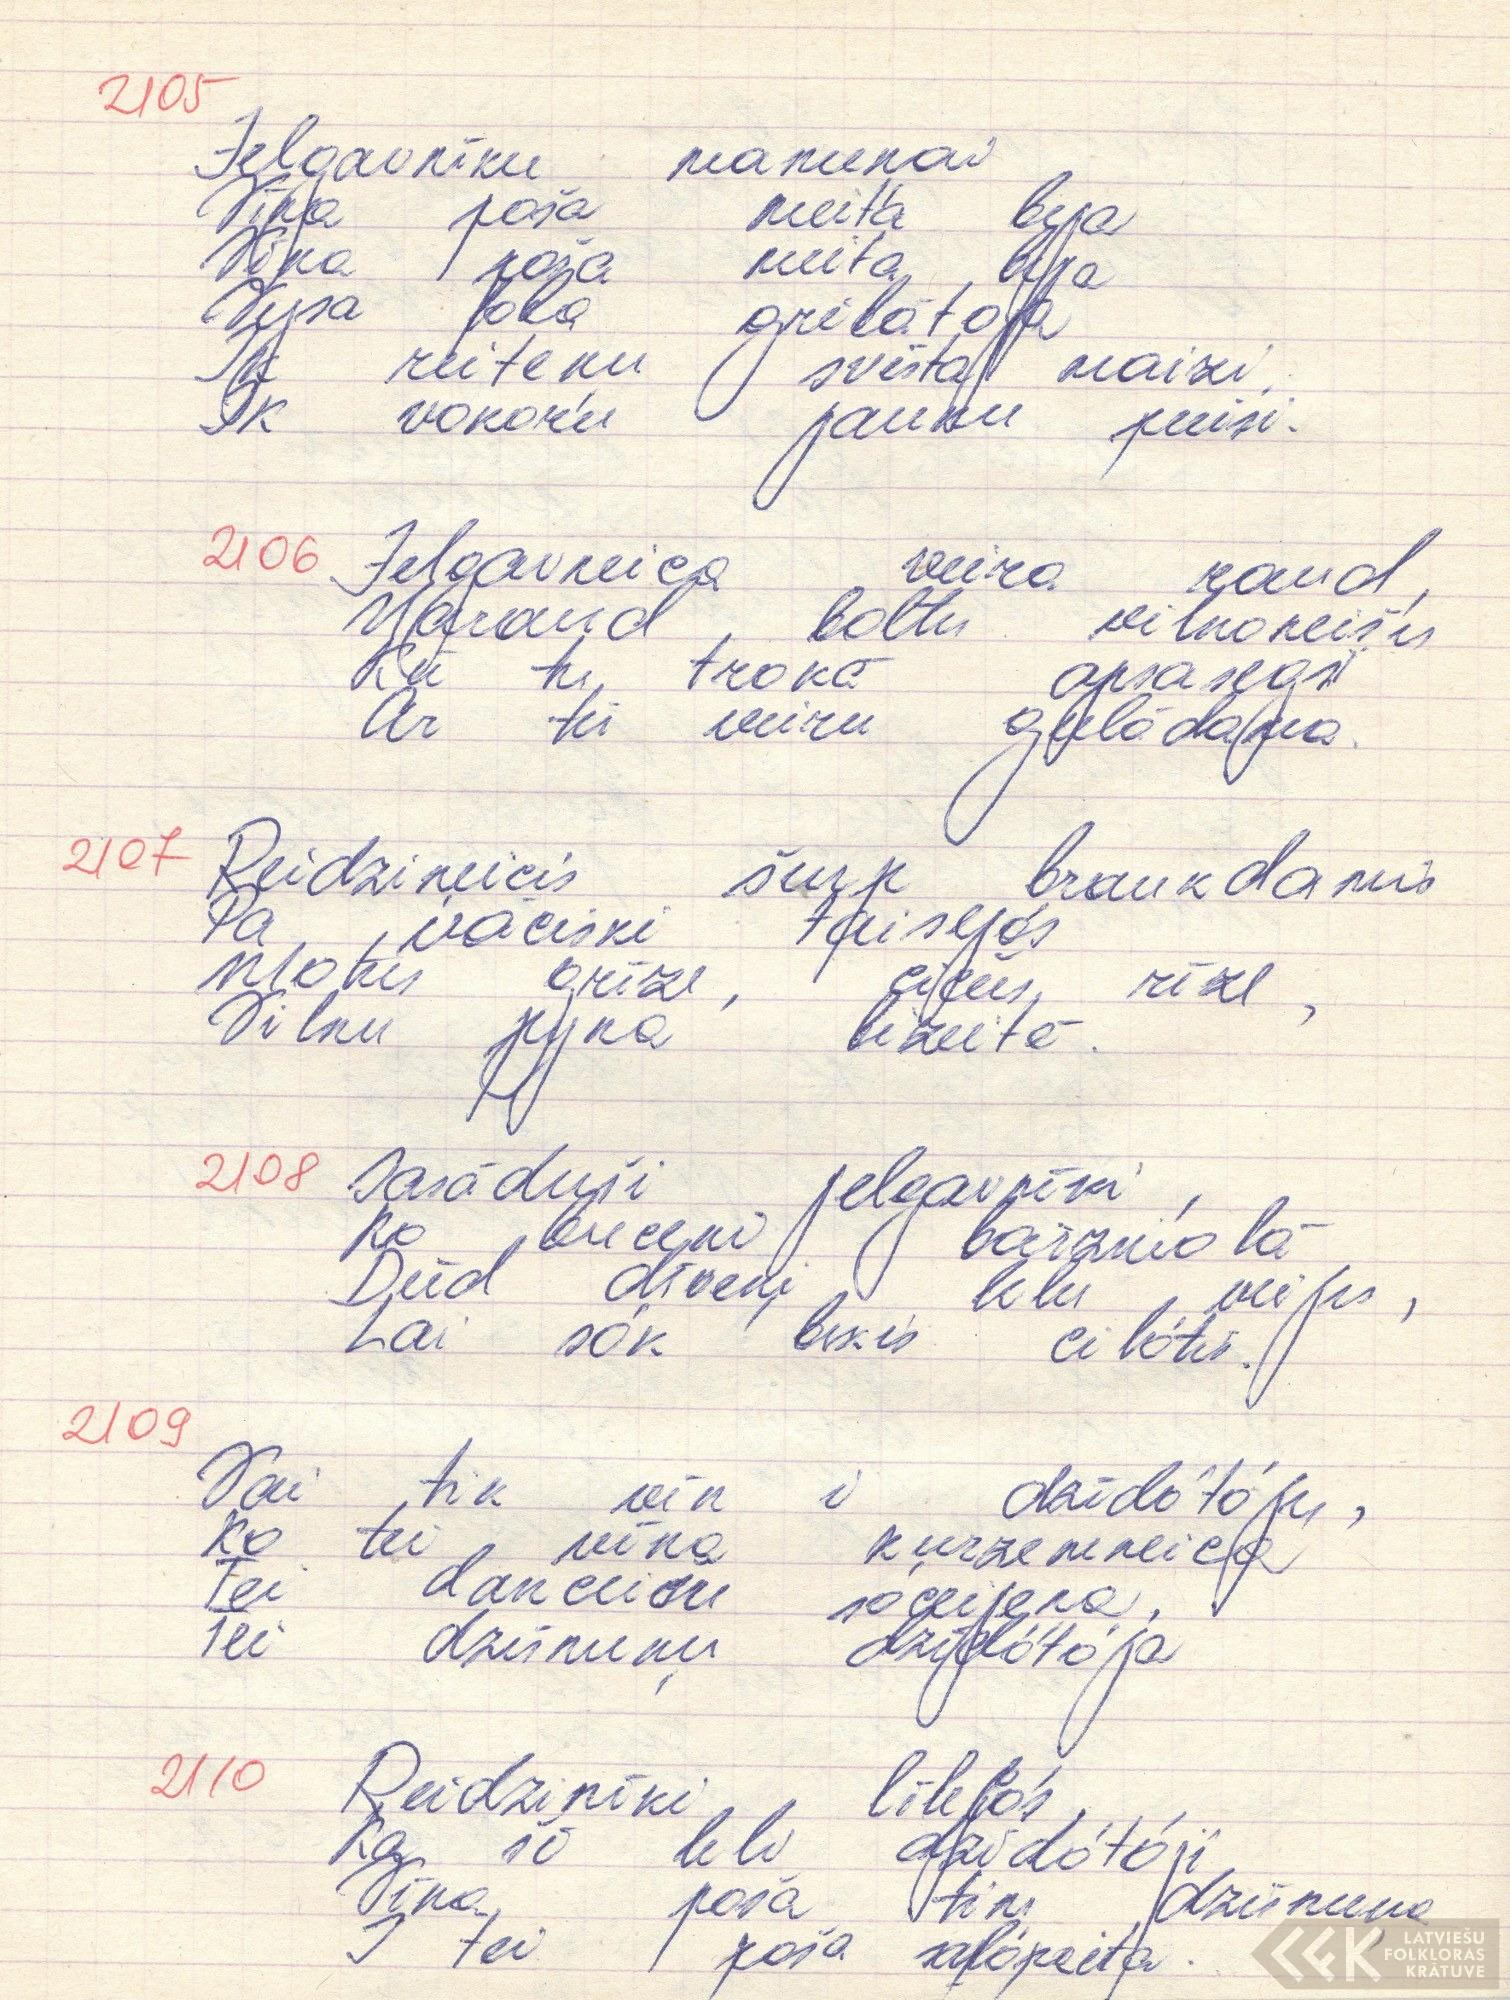 LiepU06-1992-01-0015